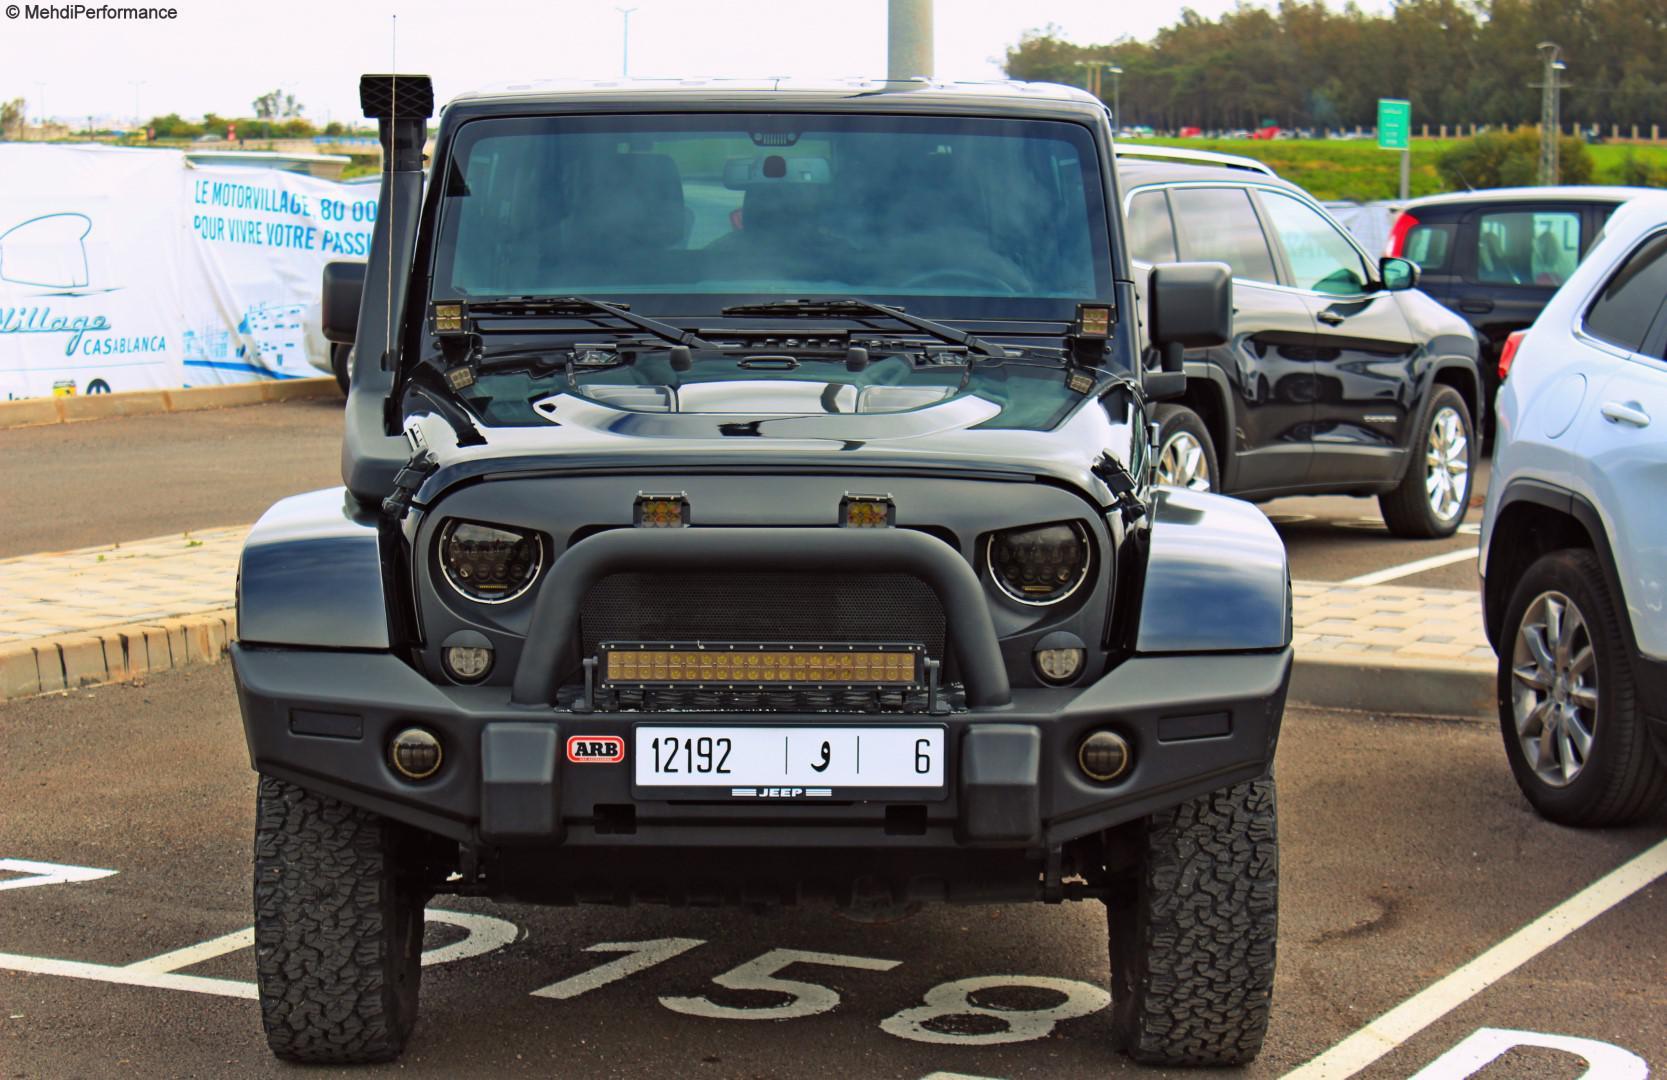 jeep-territory-le-nouveau-terrain-de-jeu-by-motor-village-716-21.jpg